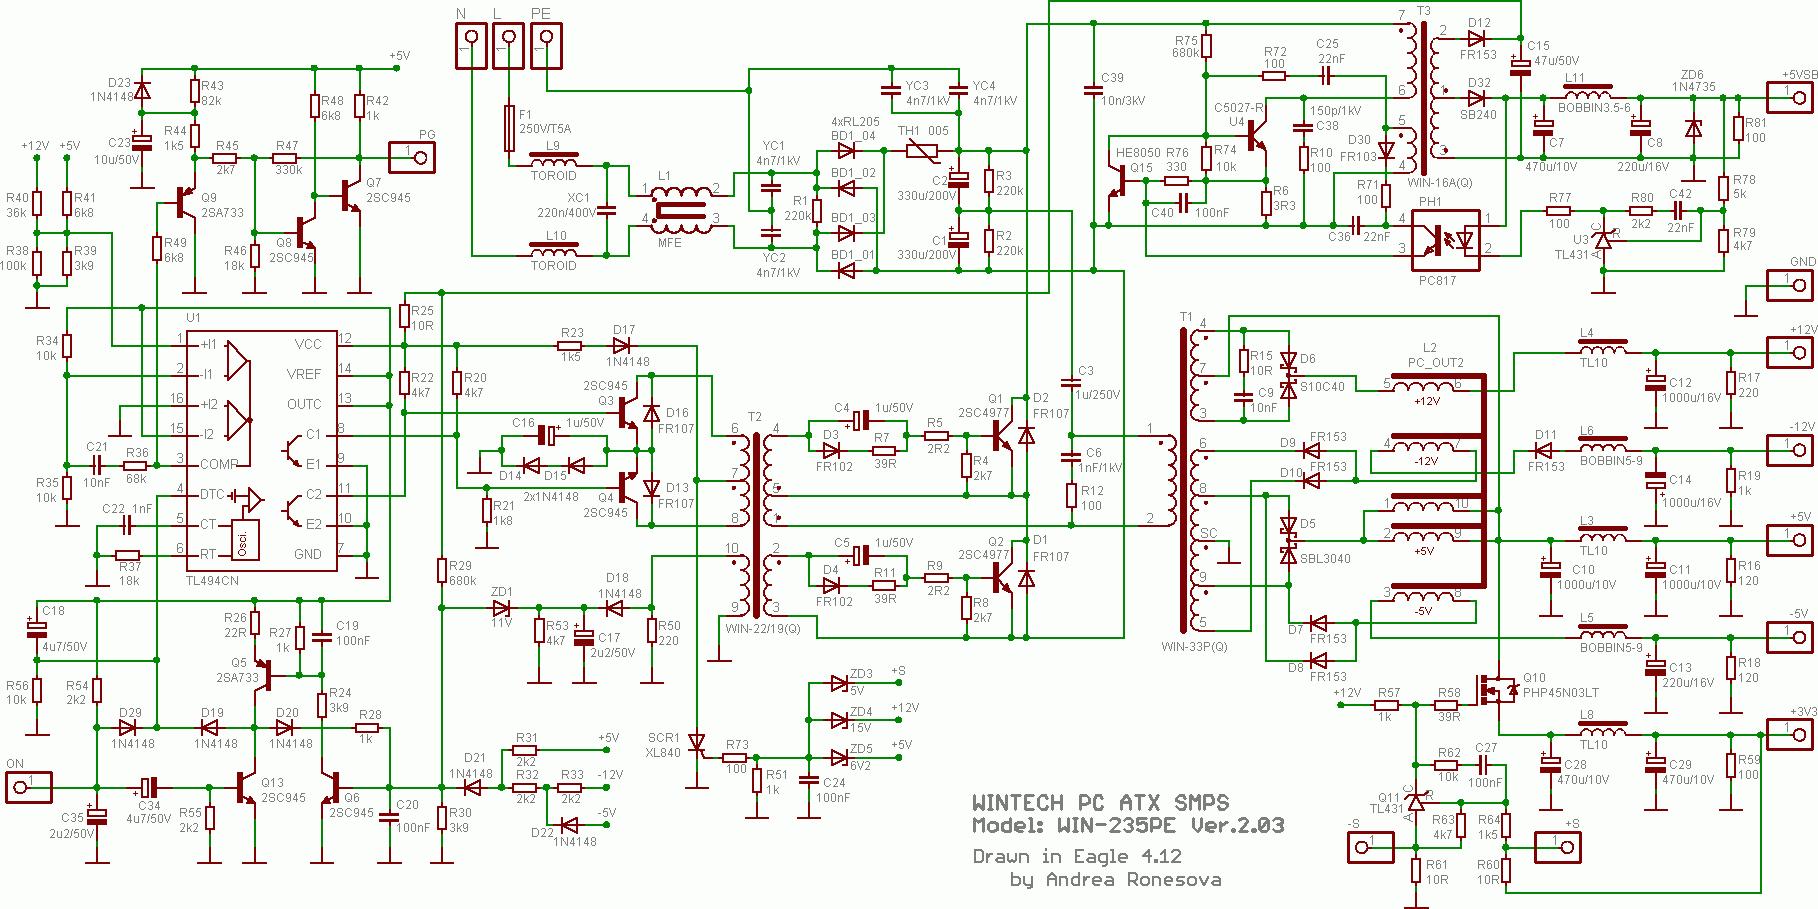 atx 450w smps circuit diagram 68 camaro steering column at and pc computer supplies schematics